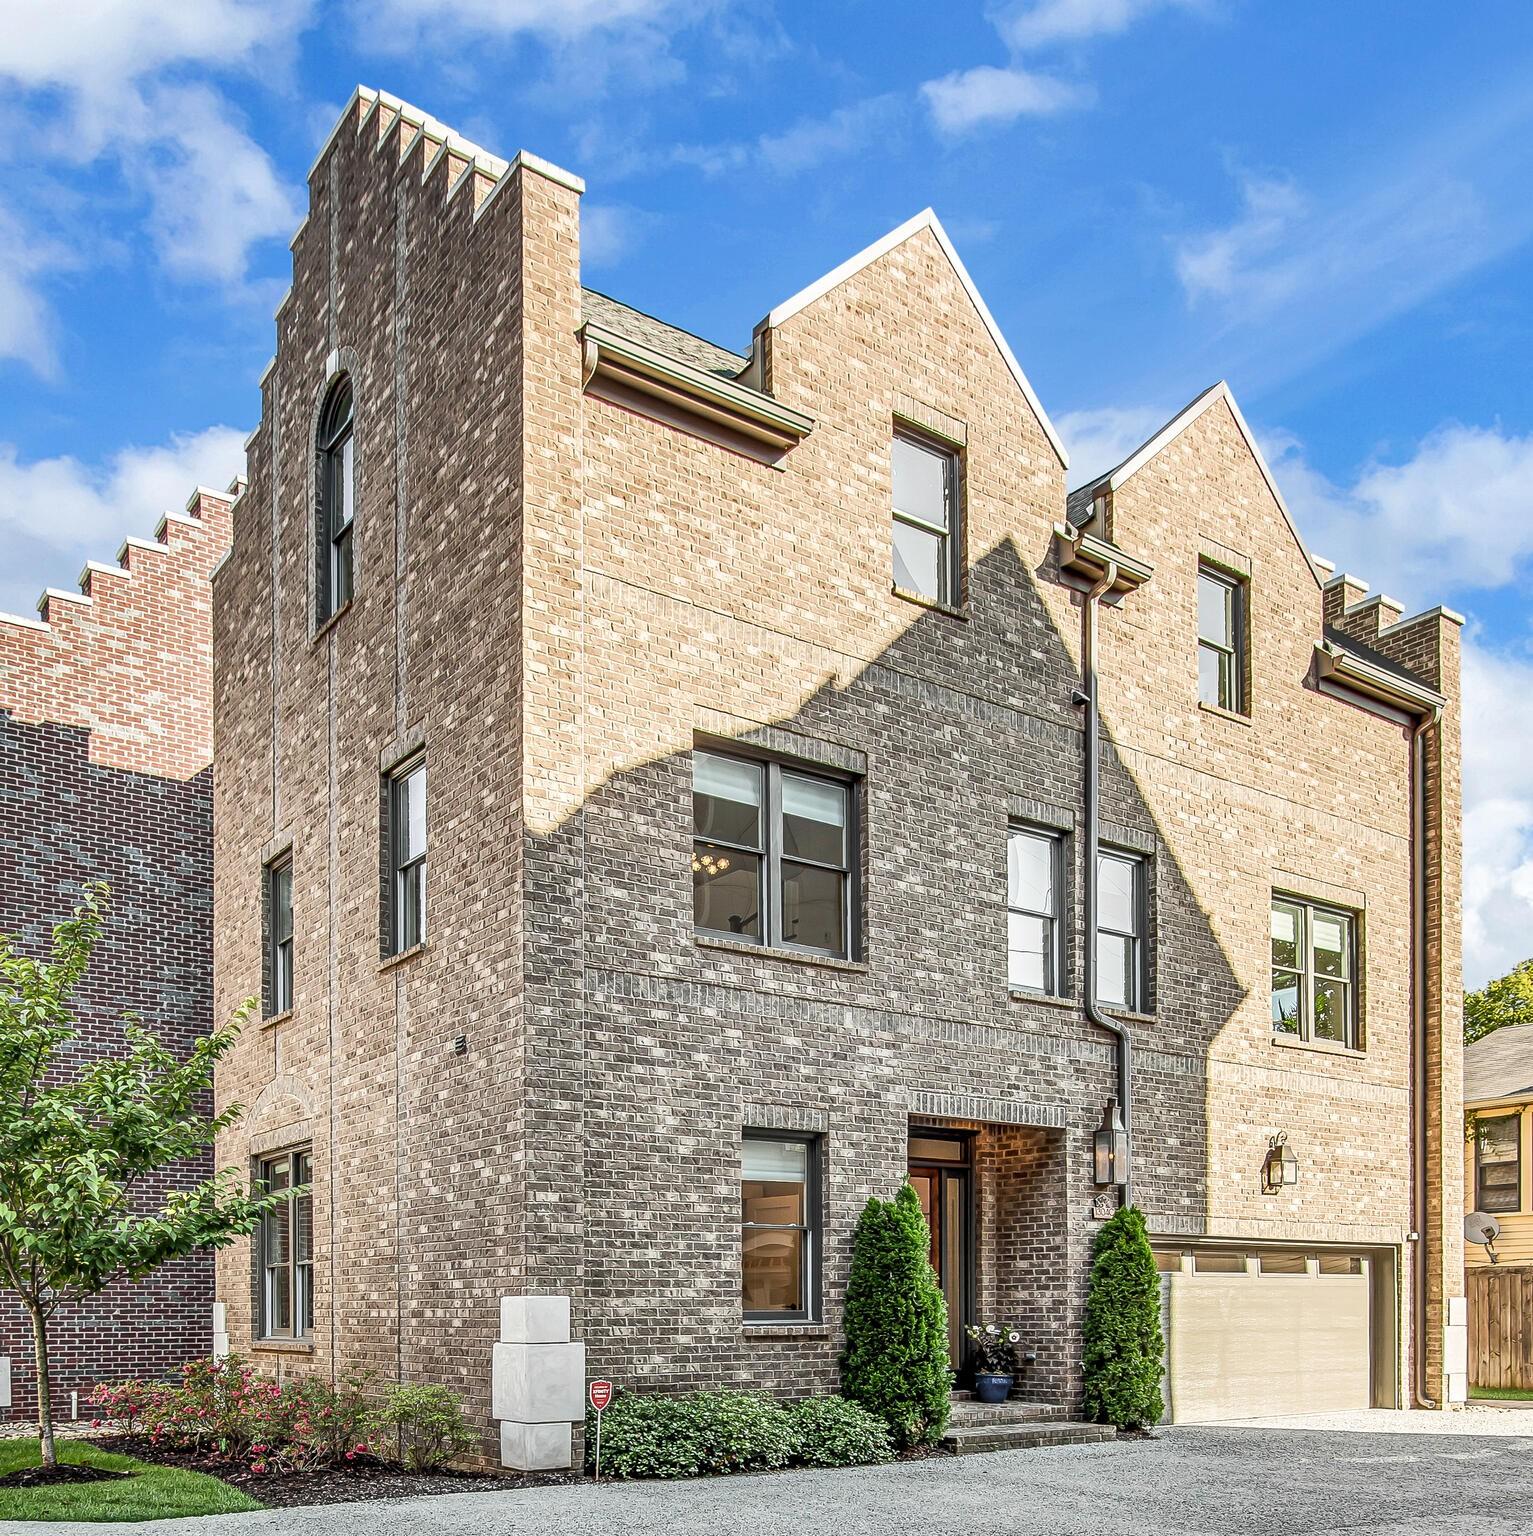 1304C 7th Ave N Property Photo - Nashville, TN real estate listing